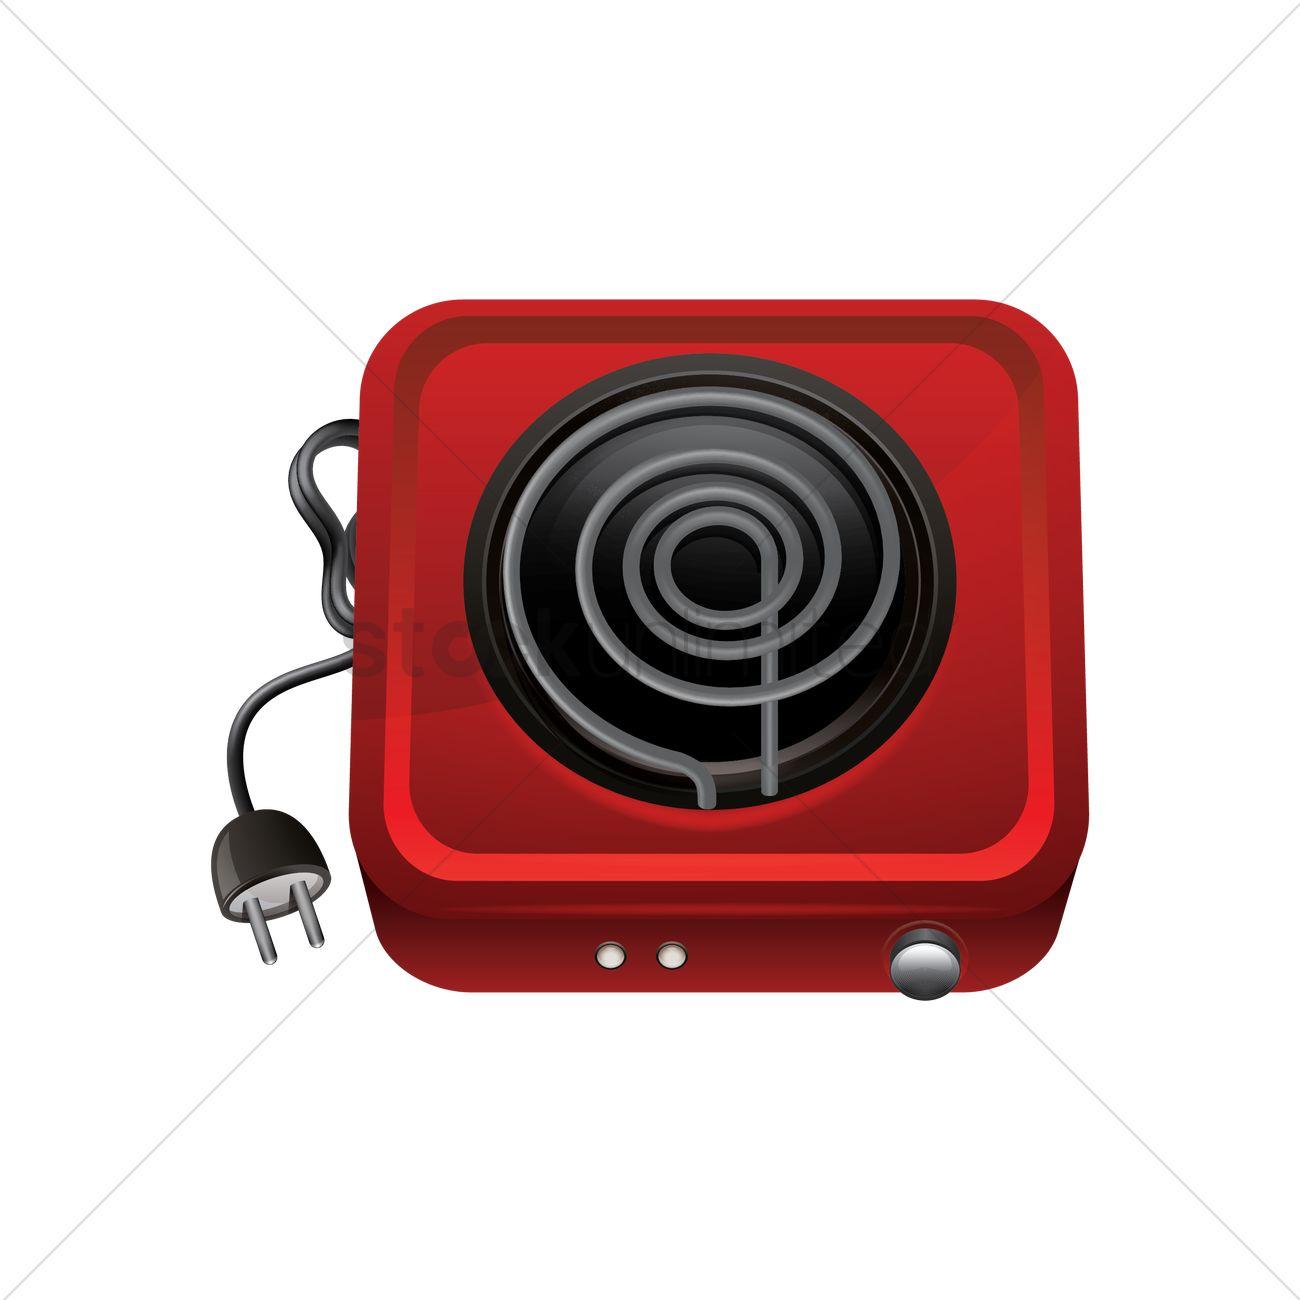 portable electric stove vector image 1812650 stockunlimited. Black Bedroom Furniture Sets. Home Design Ideas